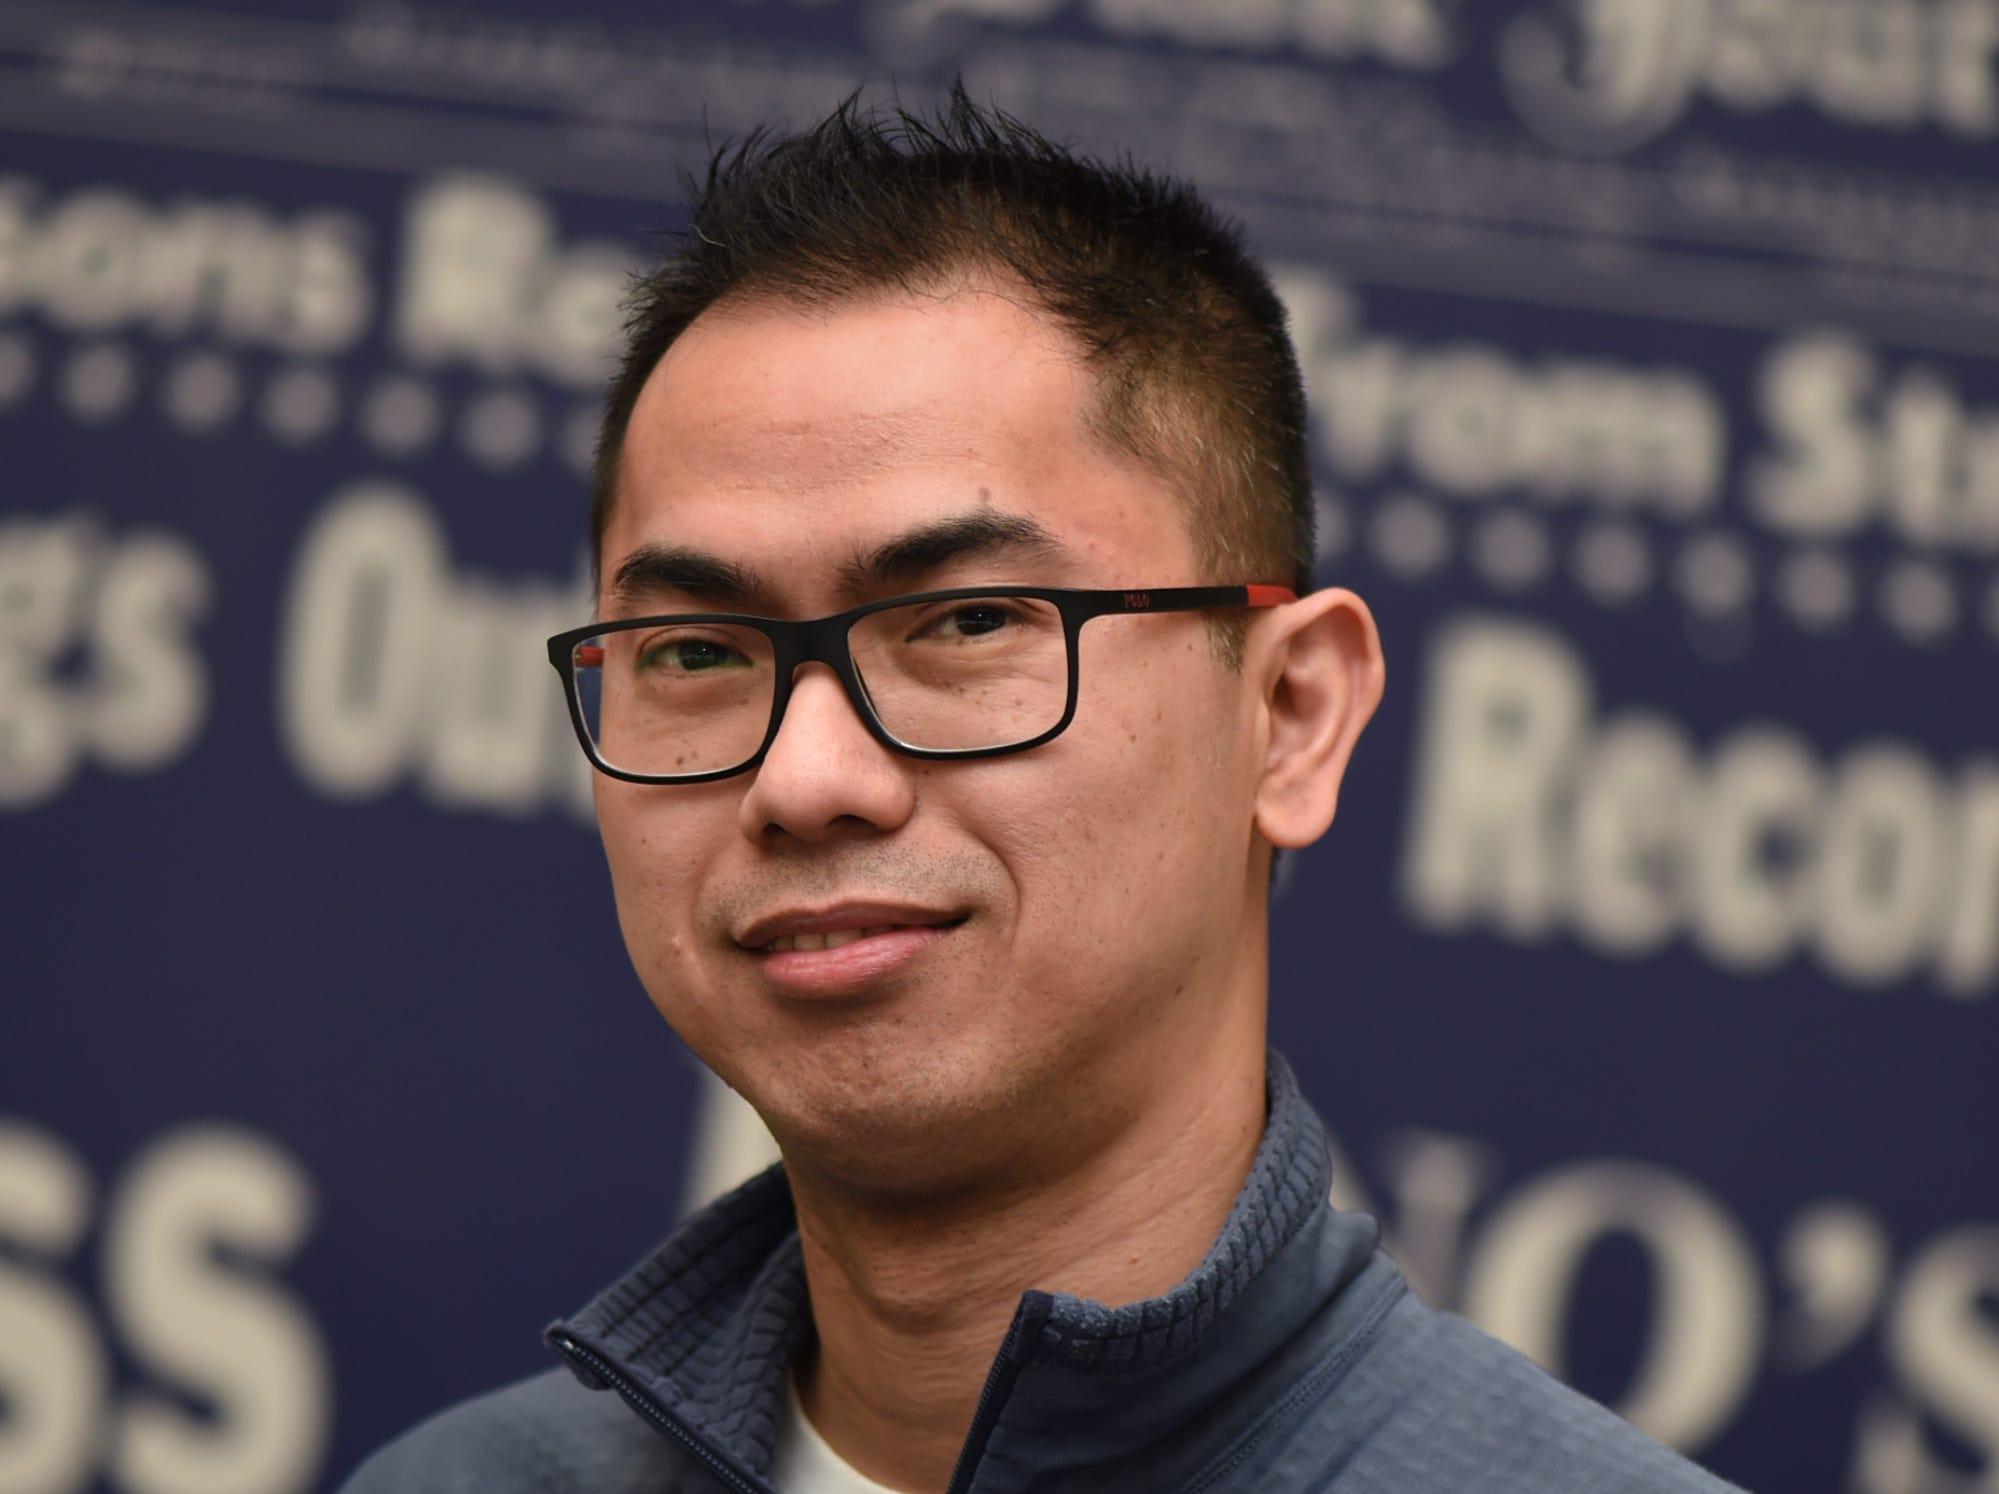 Jason Hidalgo, business and redevelopment reporter